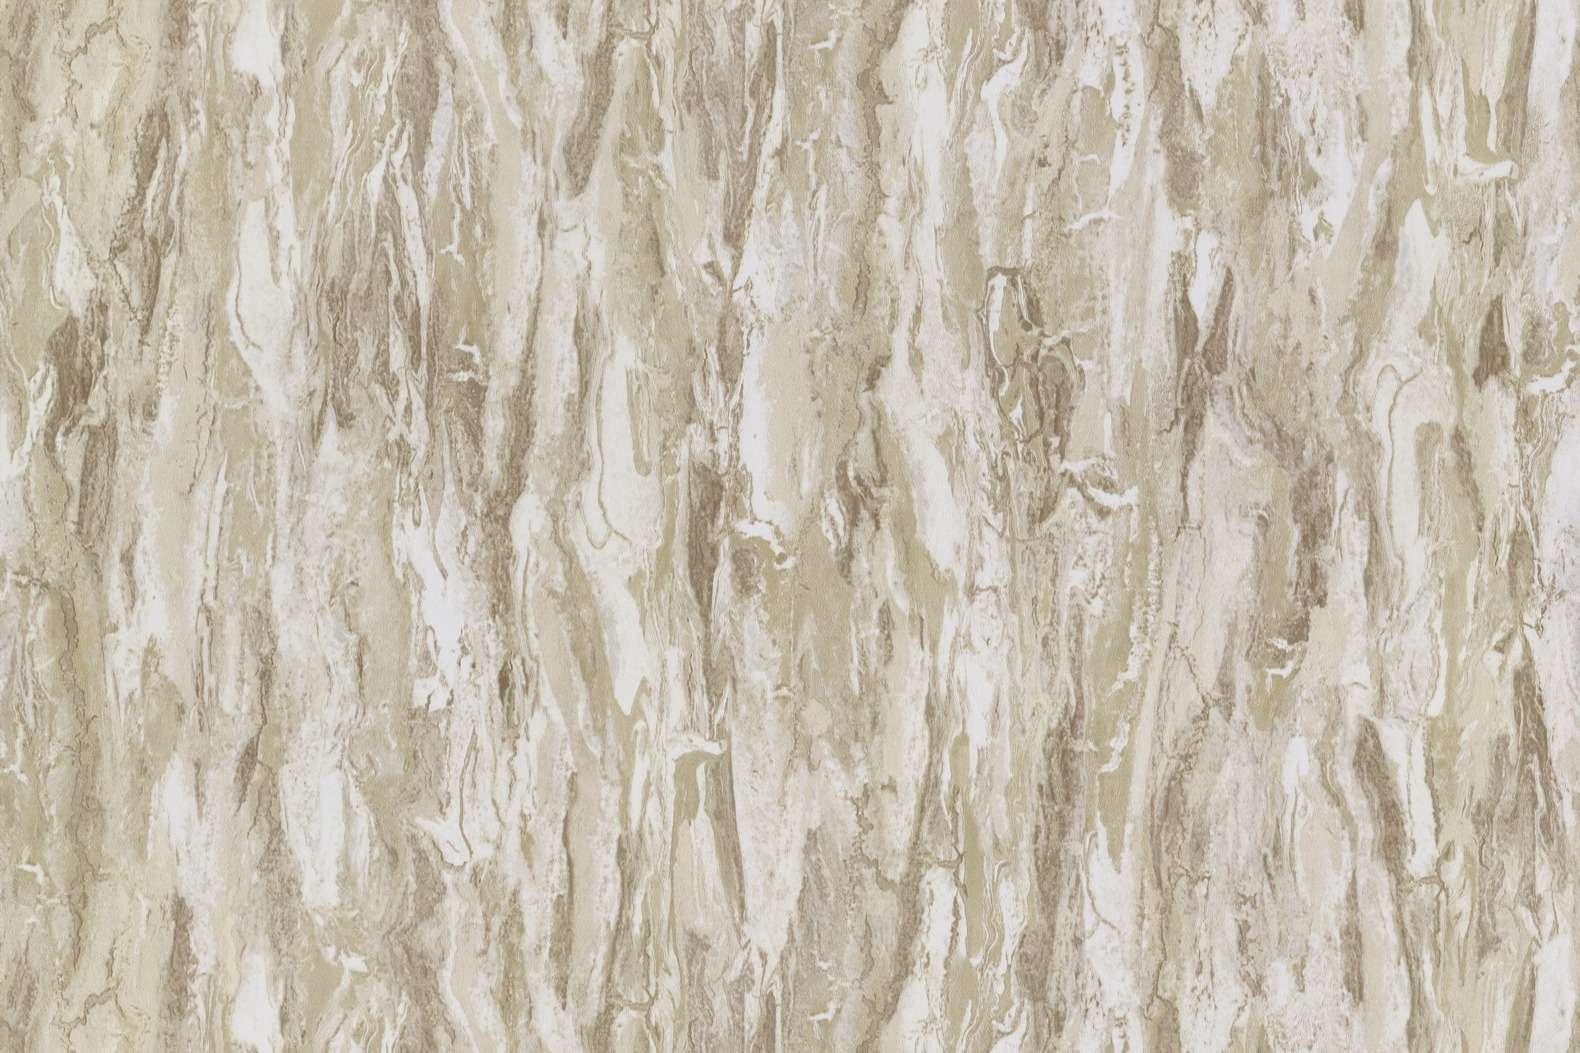 Обои Decori & Decori Carrara 2 — Декори Каррара 2 83686